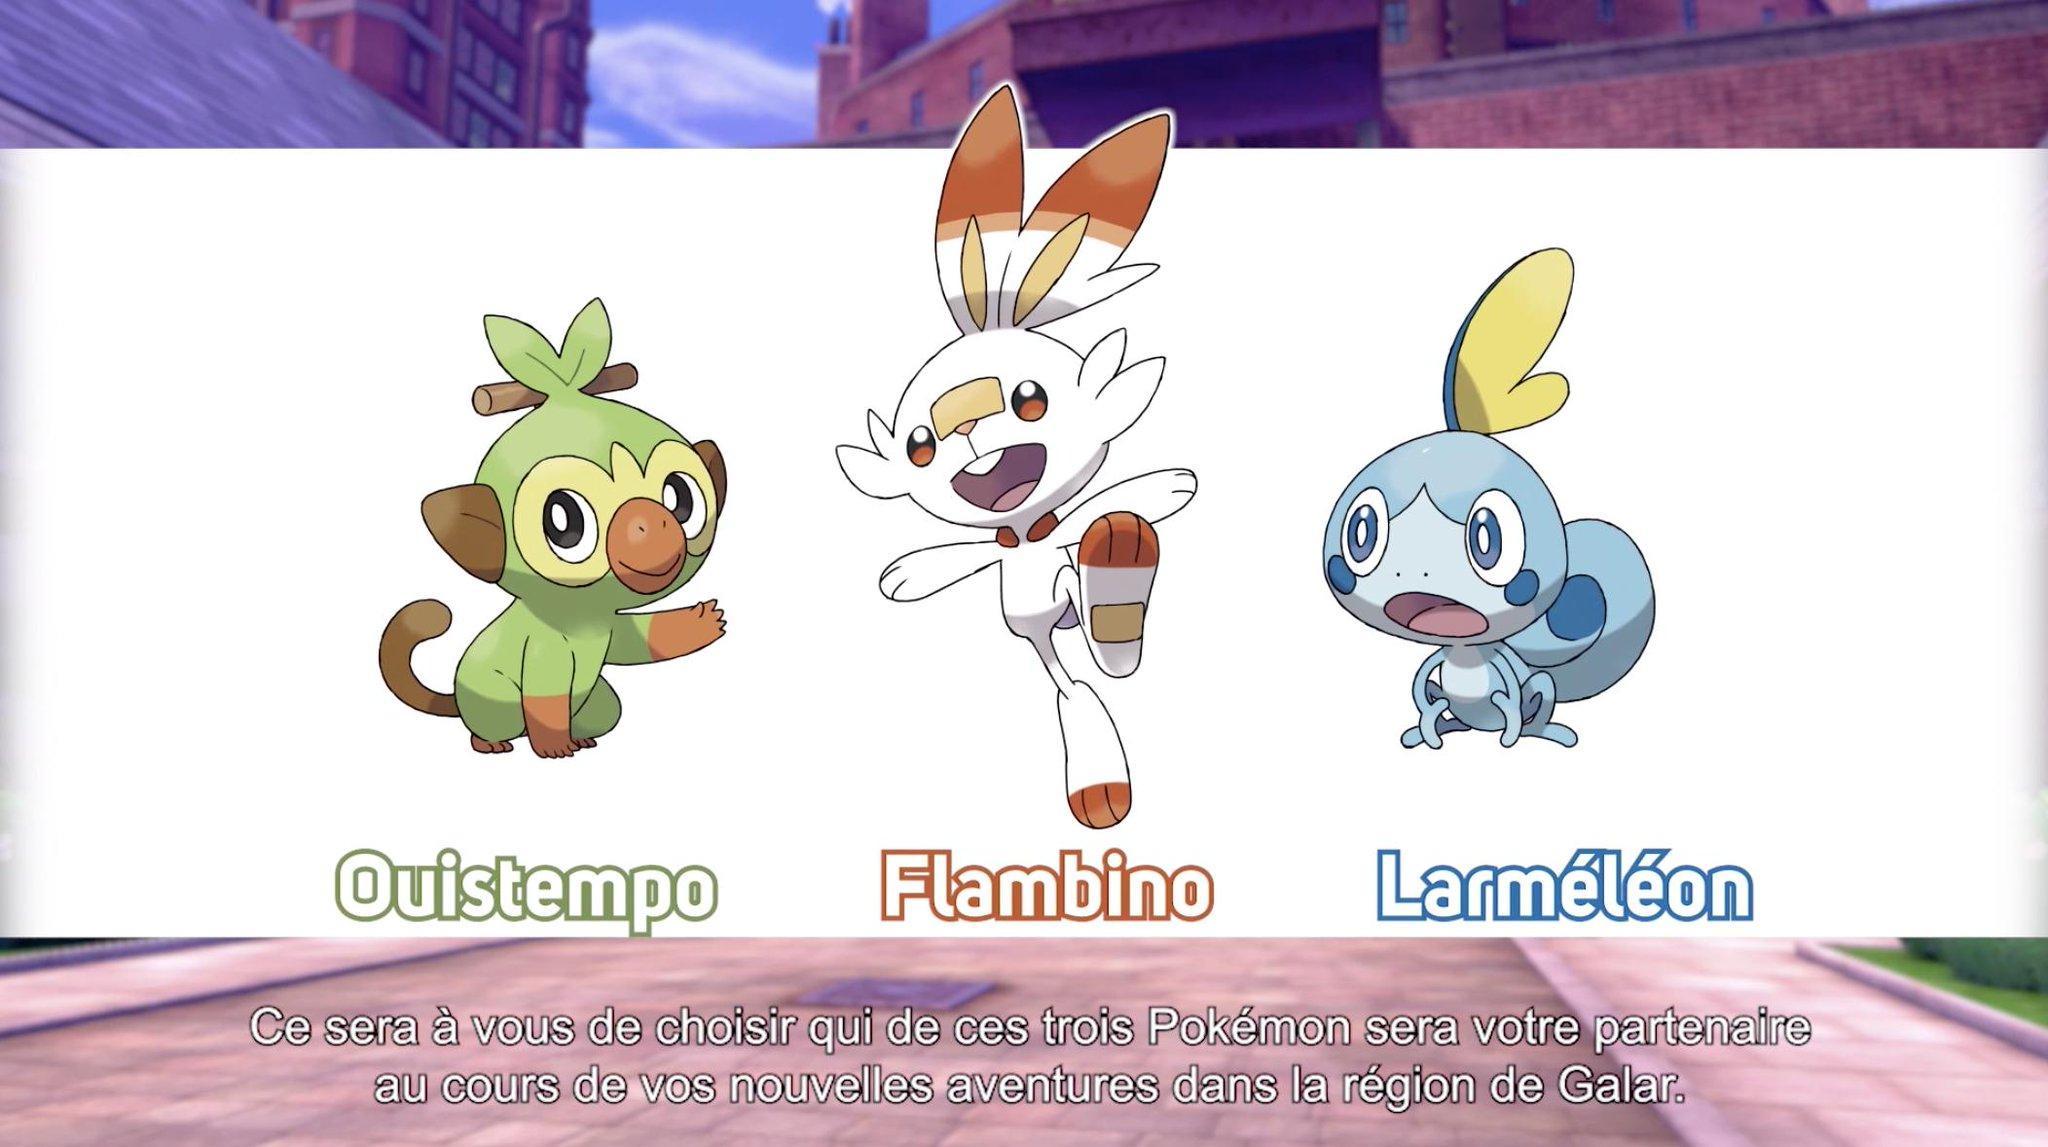 Starters Pokémon Épée et Pokémon Bouclier Ouistemp Flambino Larméléon